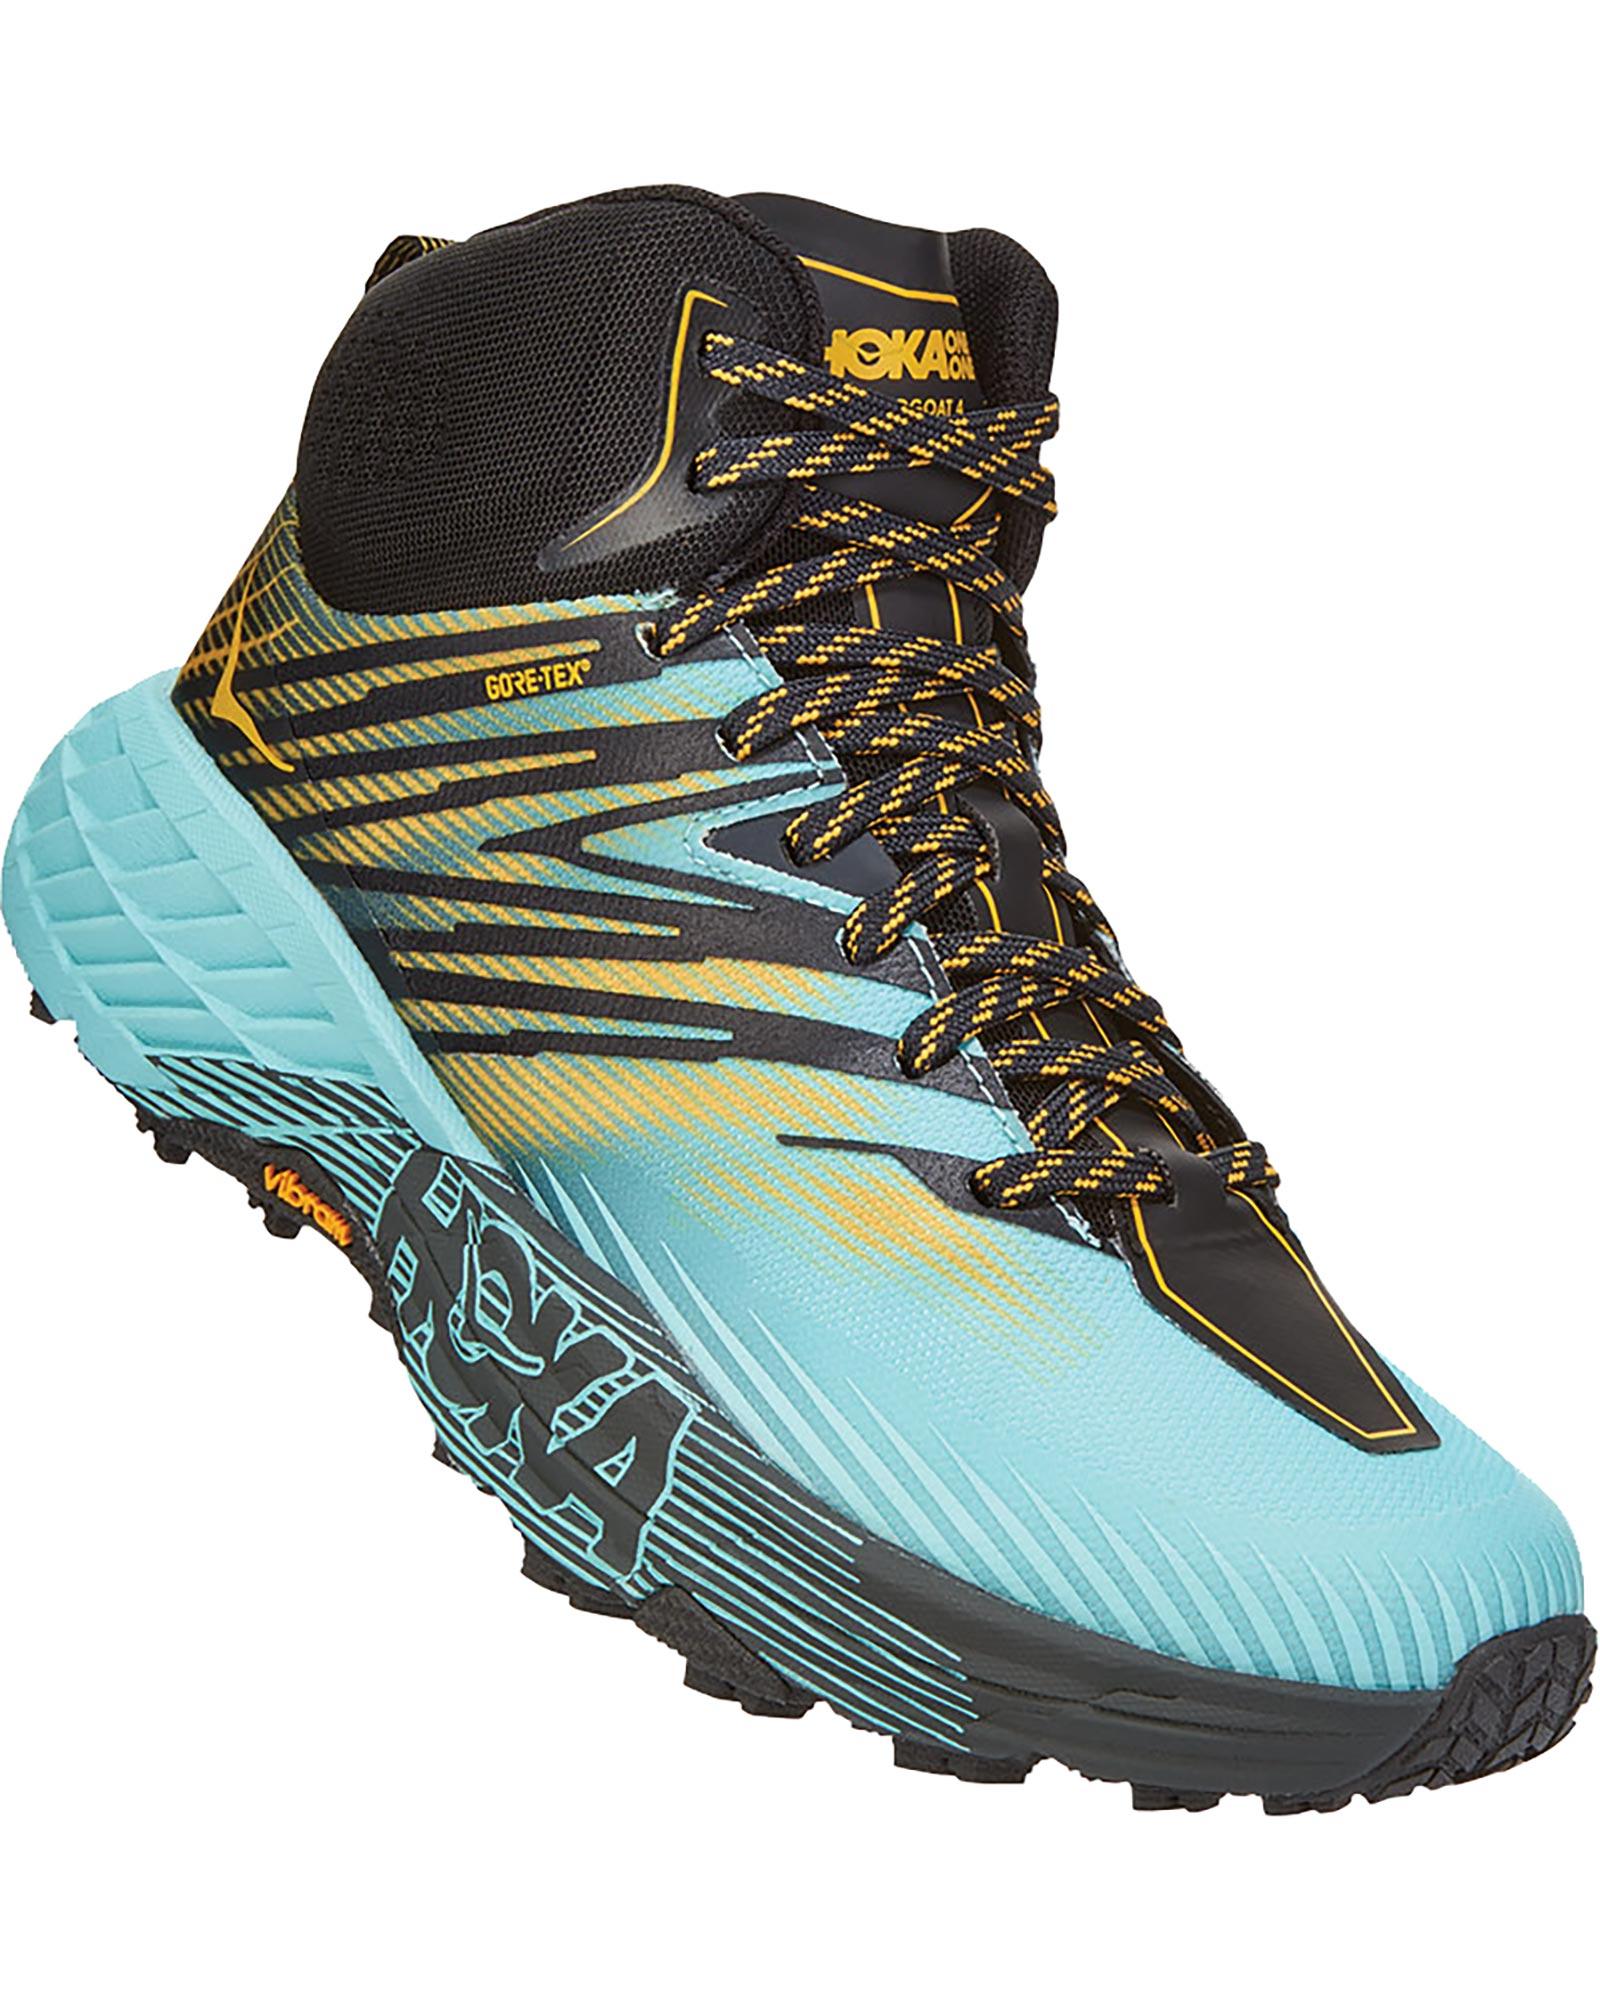 Hoka One One Speedgoat 2 Mid GORE-TEX Women's Boots 0